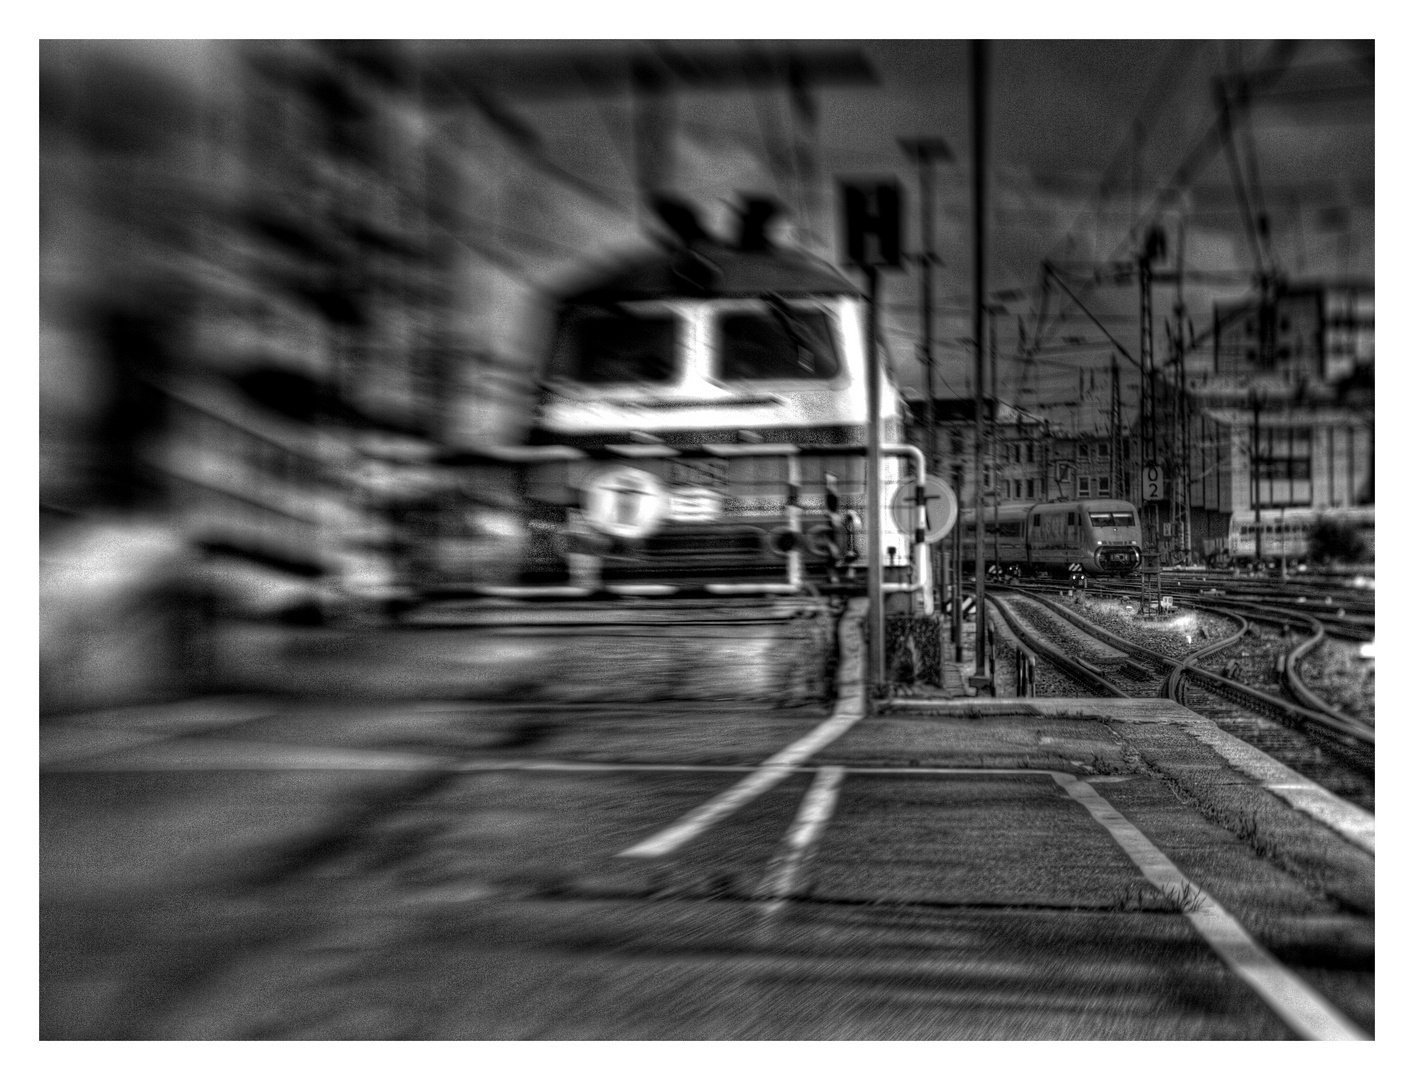 Bahnhofsbild ...